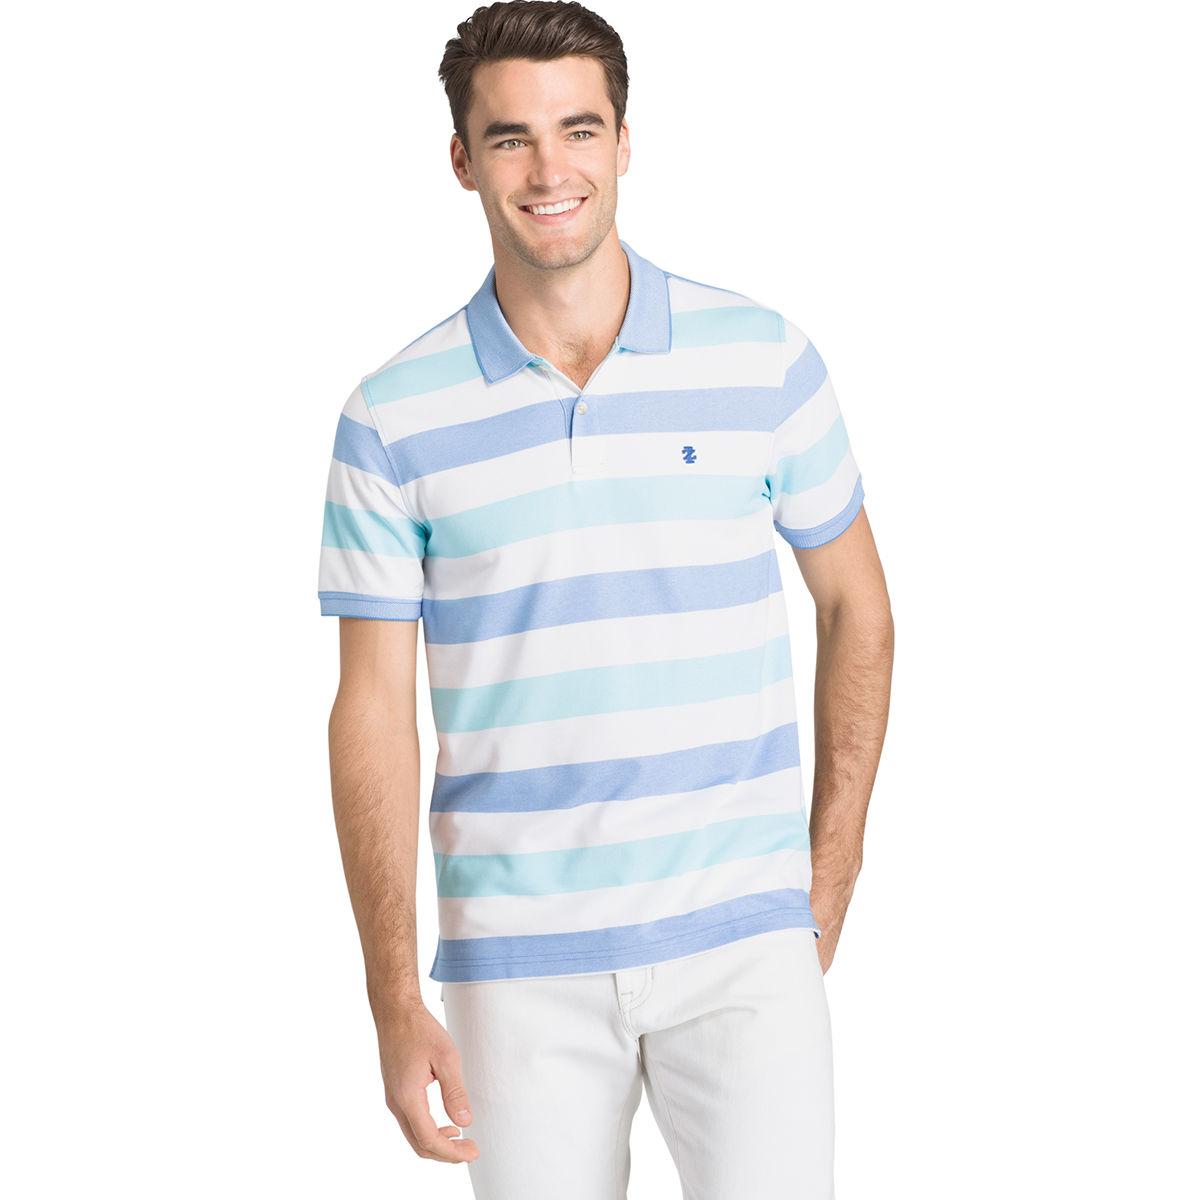 Izod Men's Advantage Performance Stripe Short-Sleeve Polo Shirt - Blue, XXL